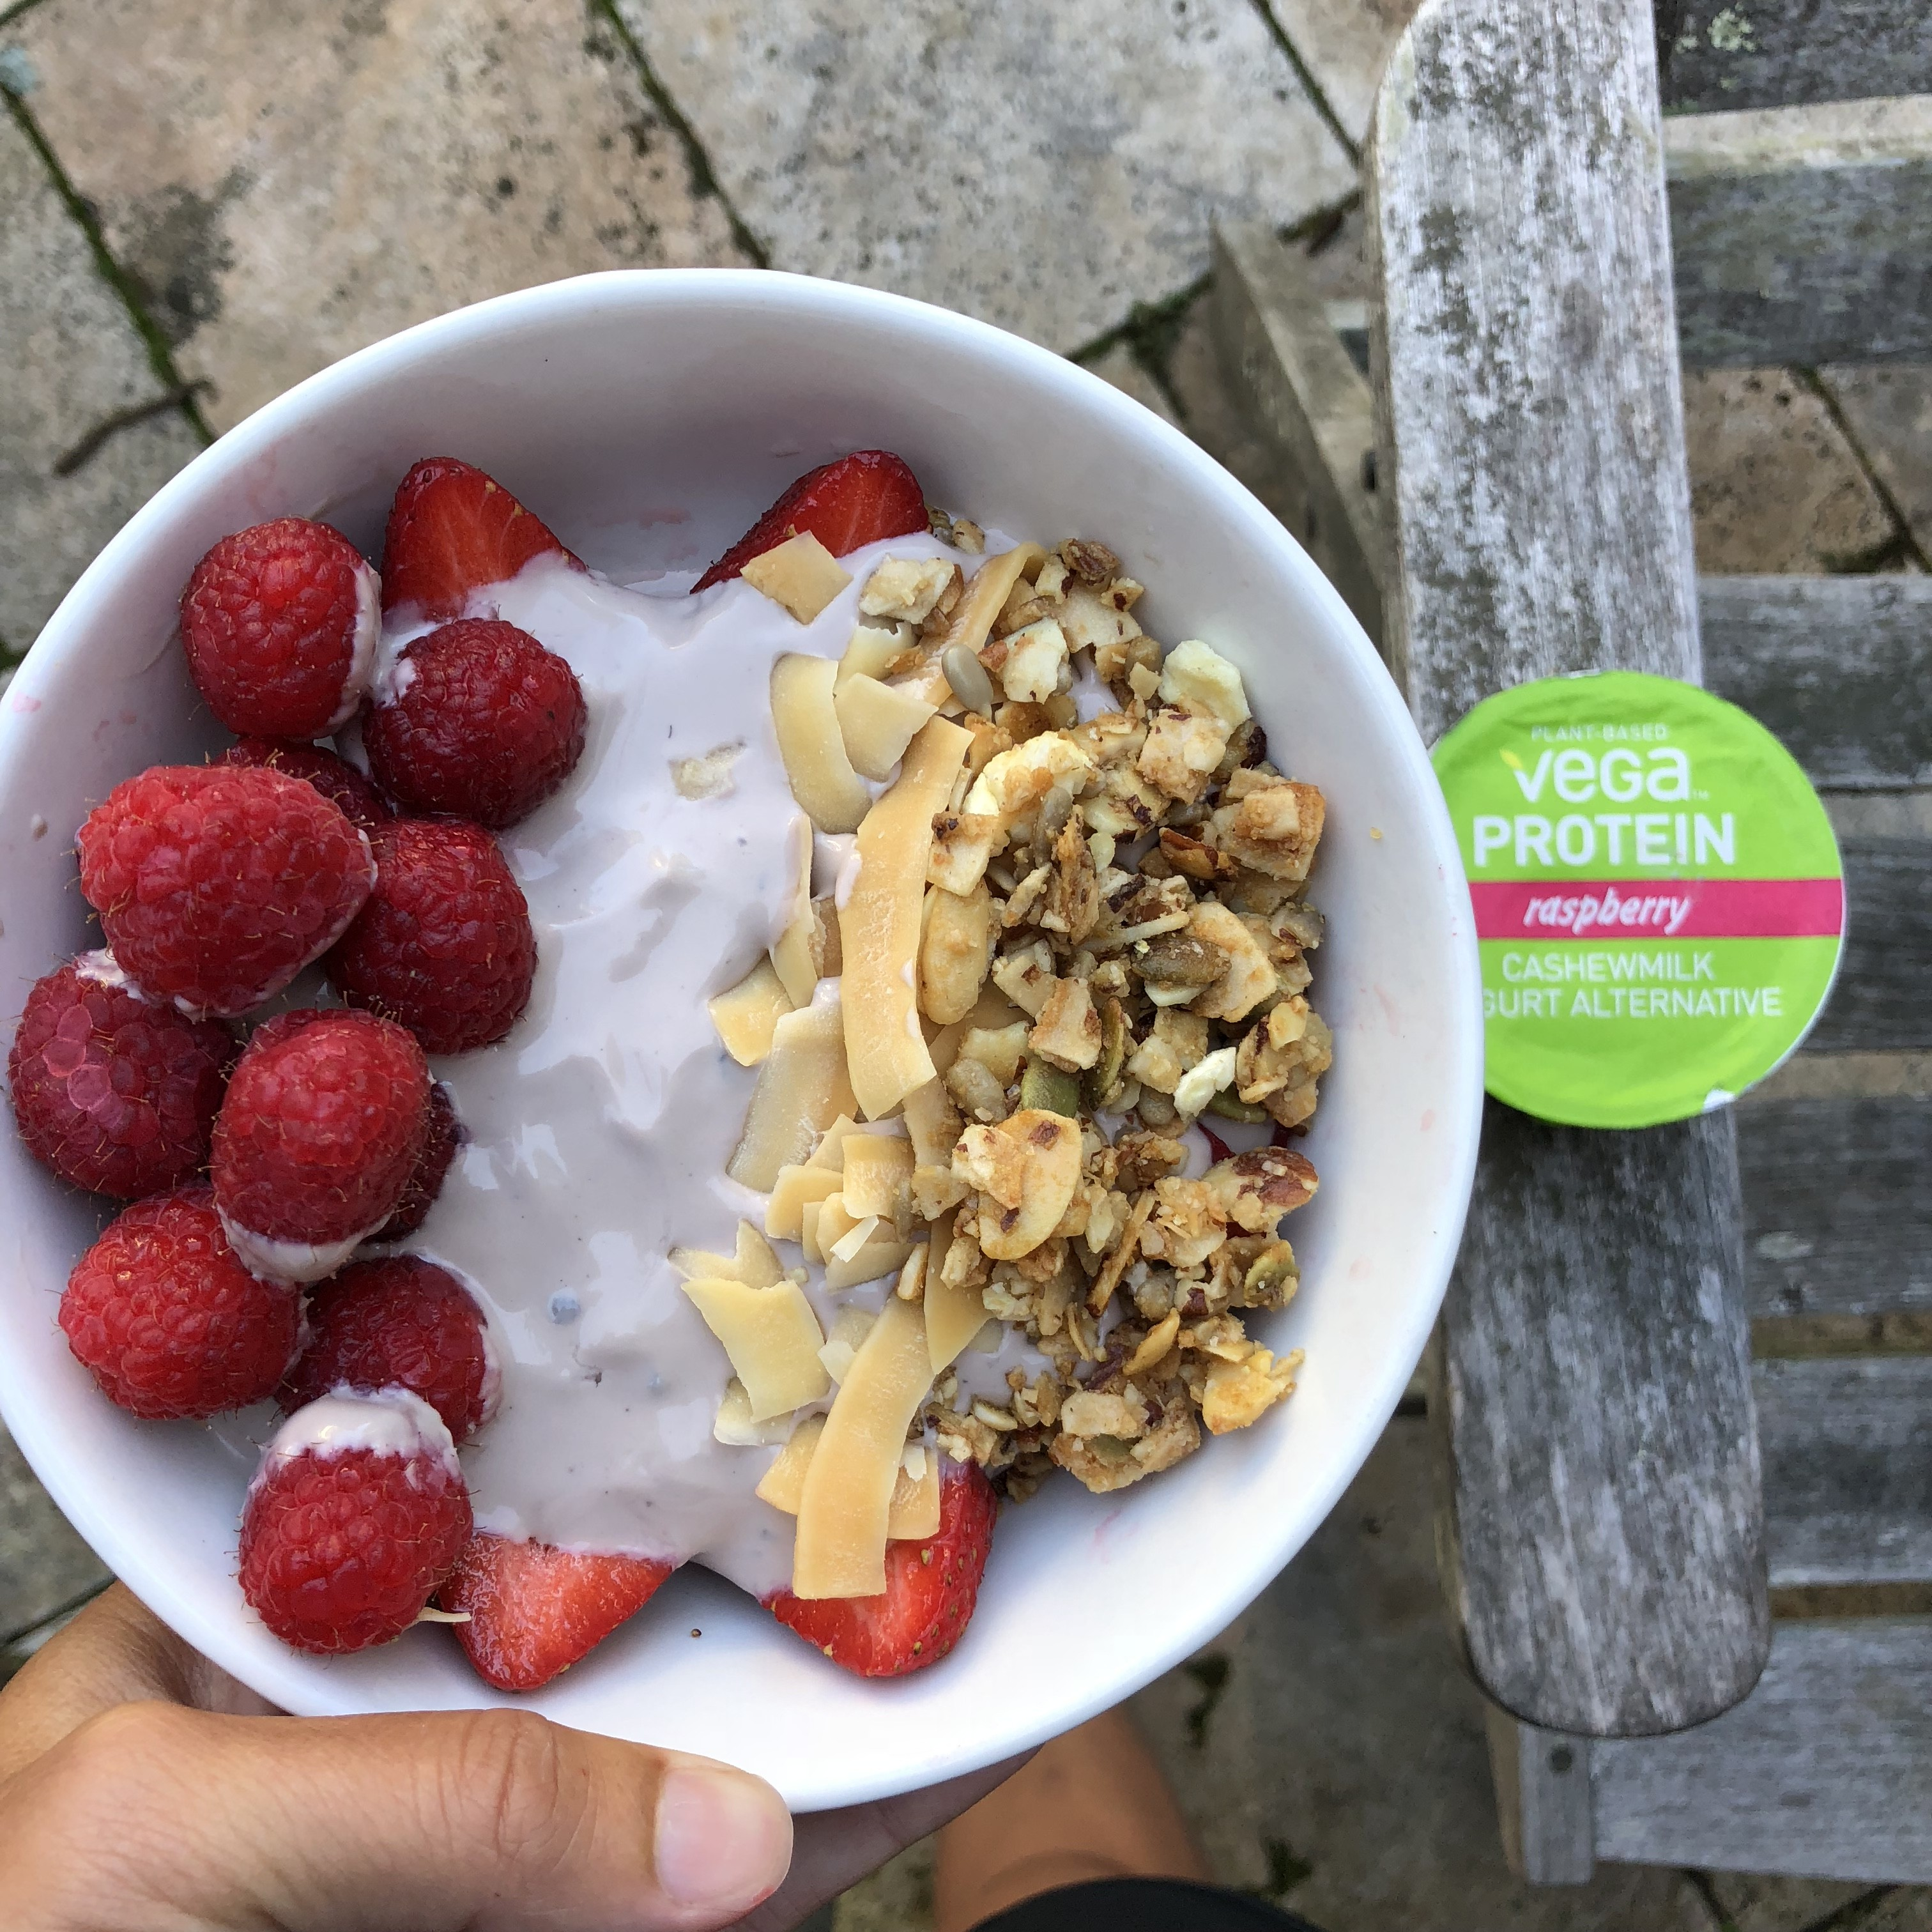 Vega Protein Cashewmilk Yogurt Alternative Review